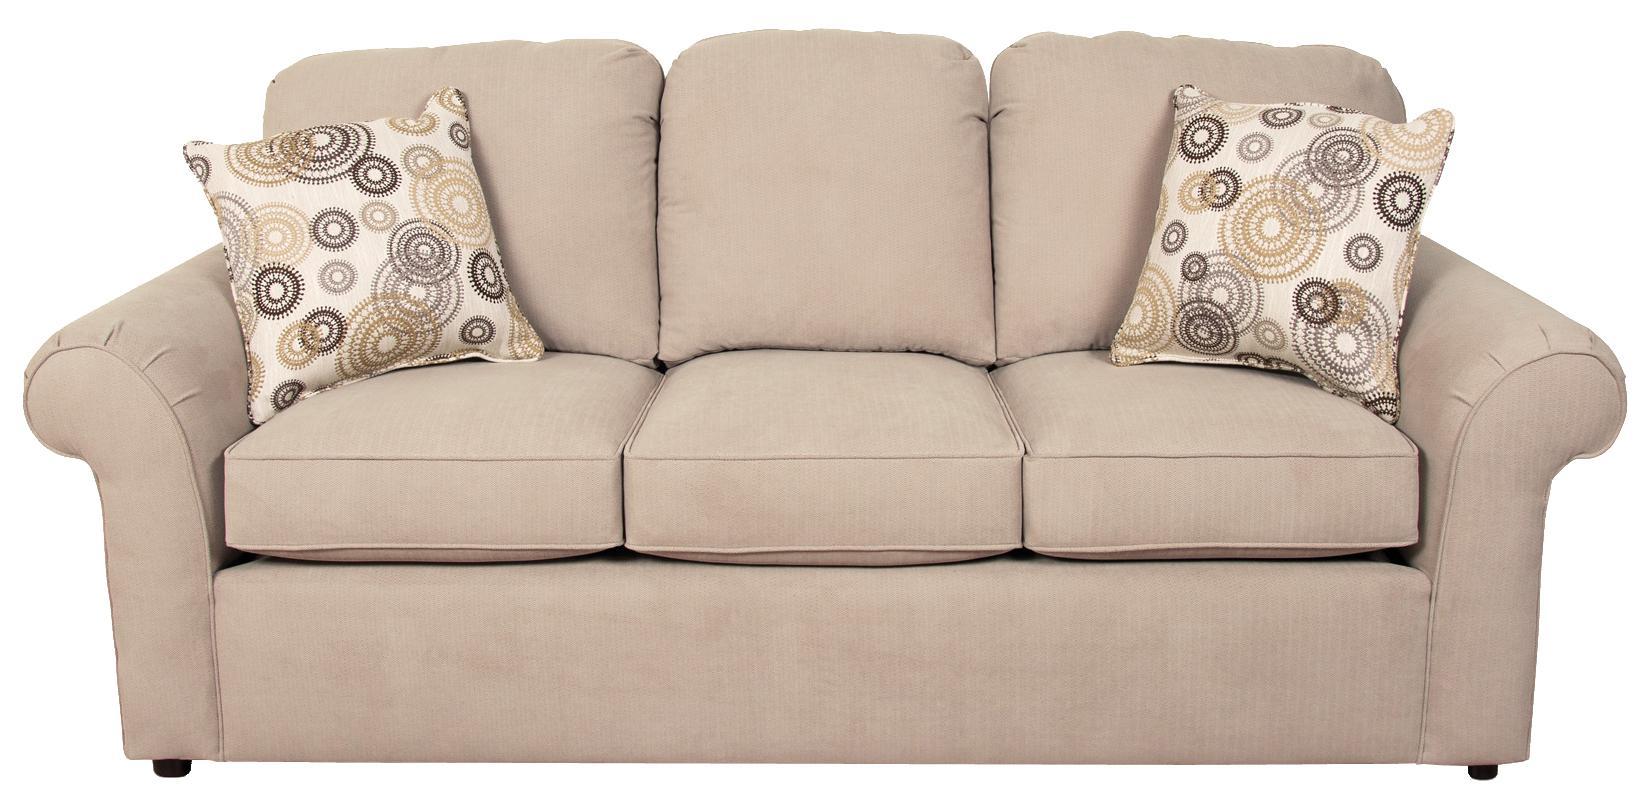 Malibu Sofa by England at Virginia Furniture Market